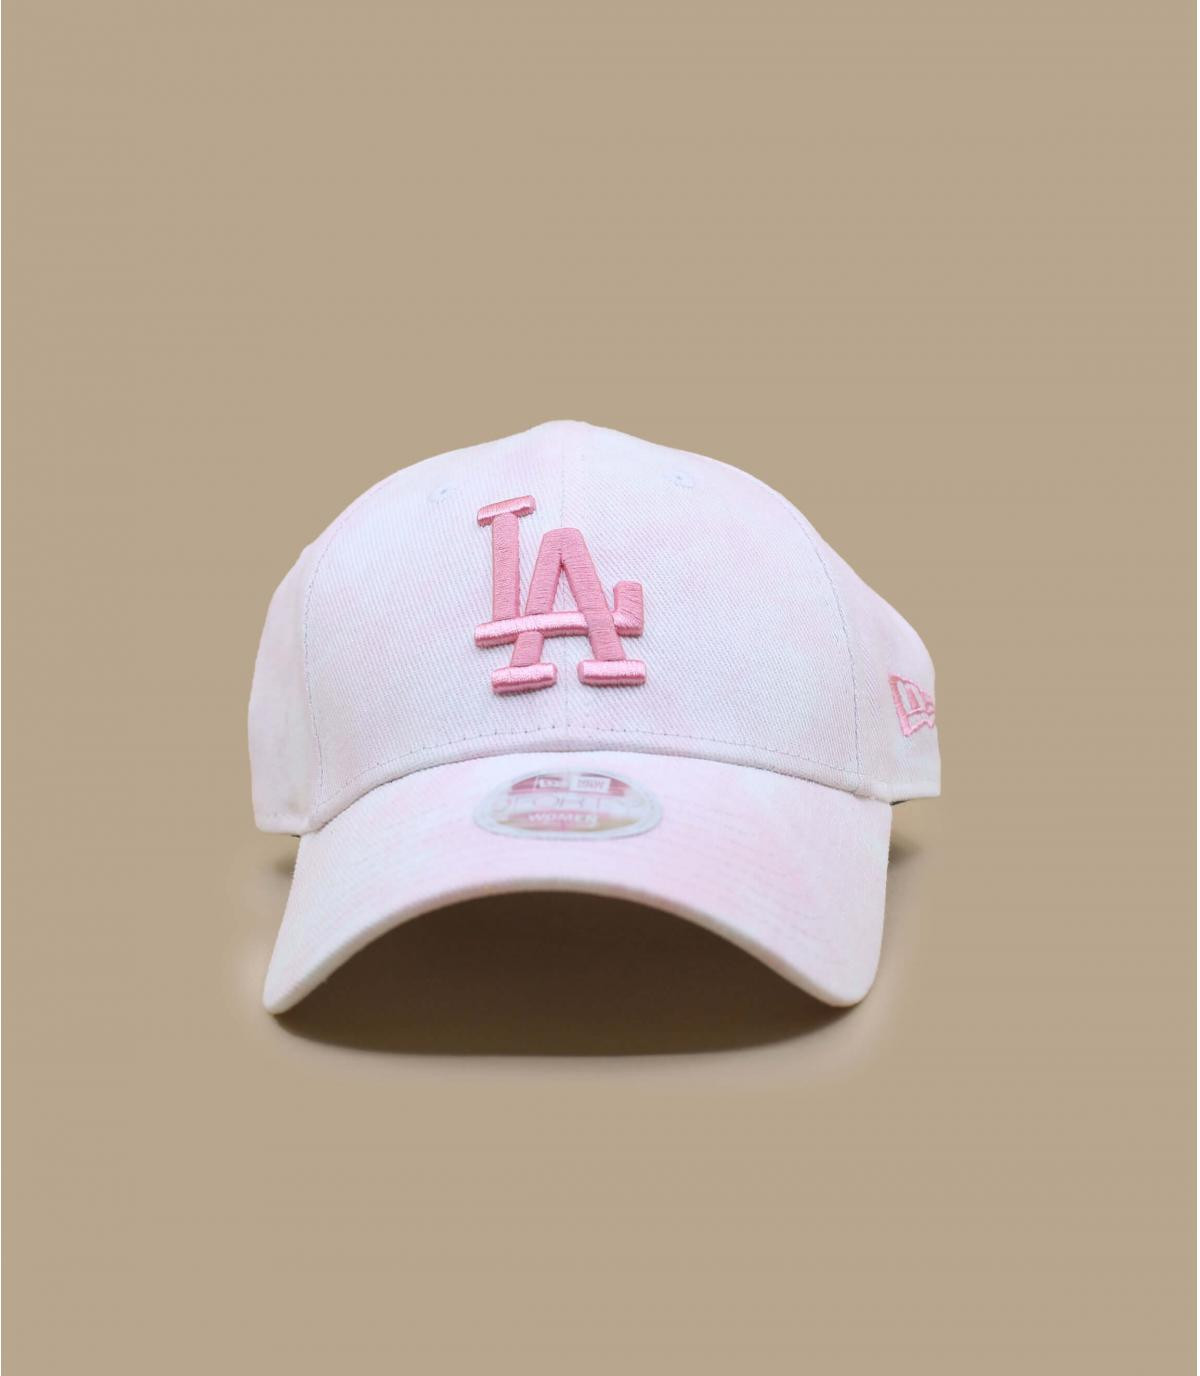 casquette LA blanc rose